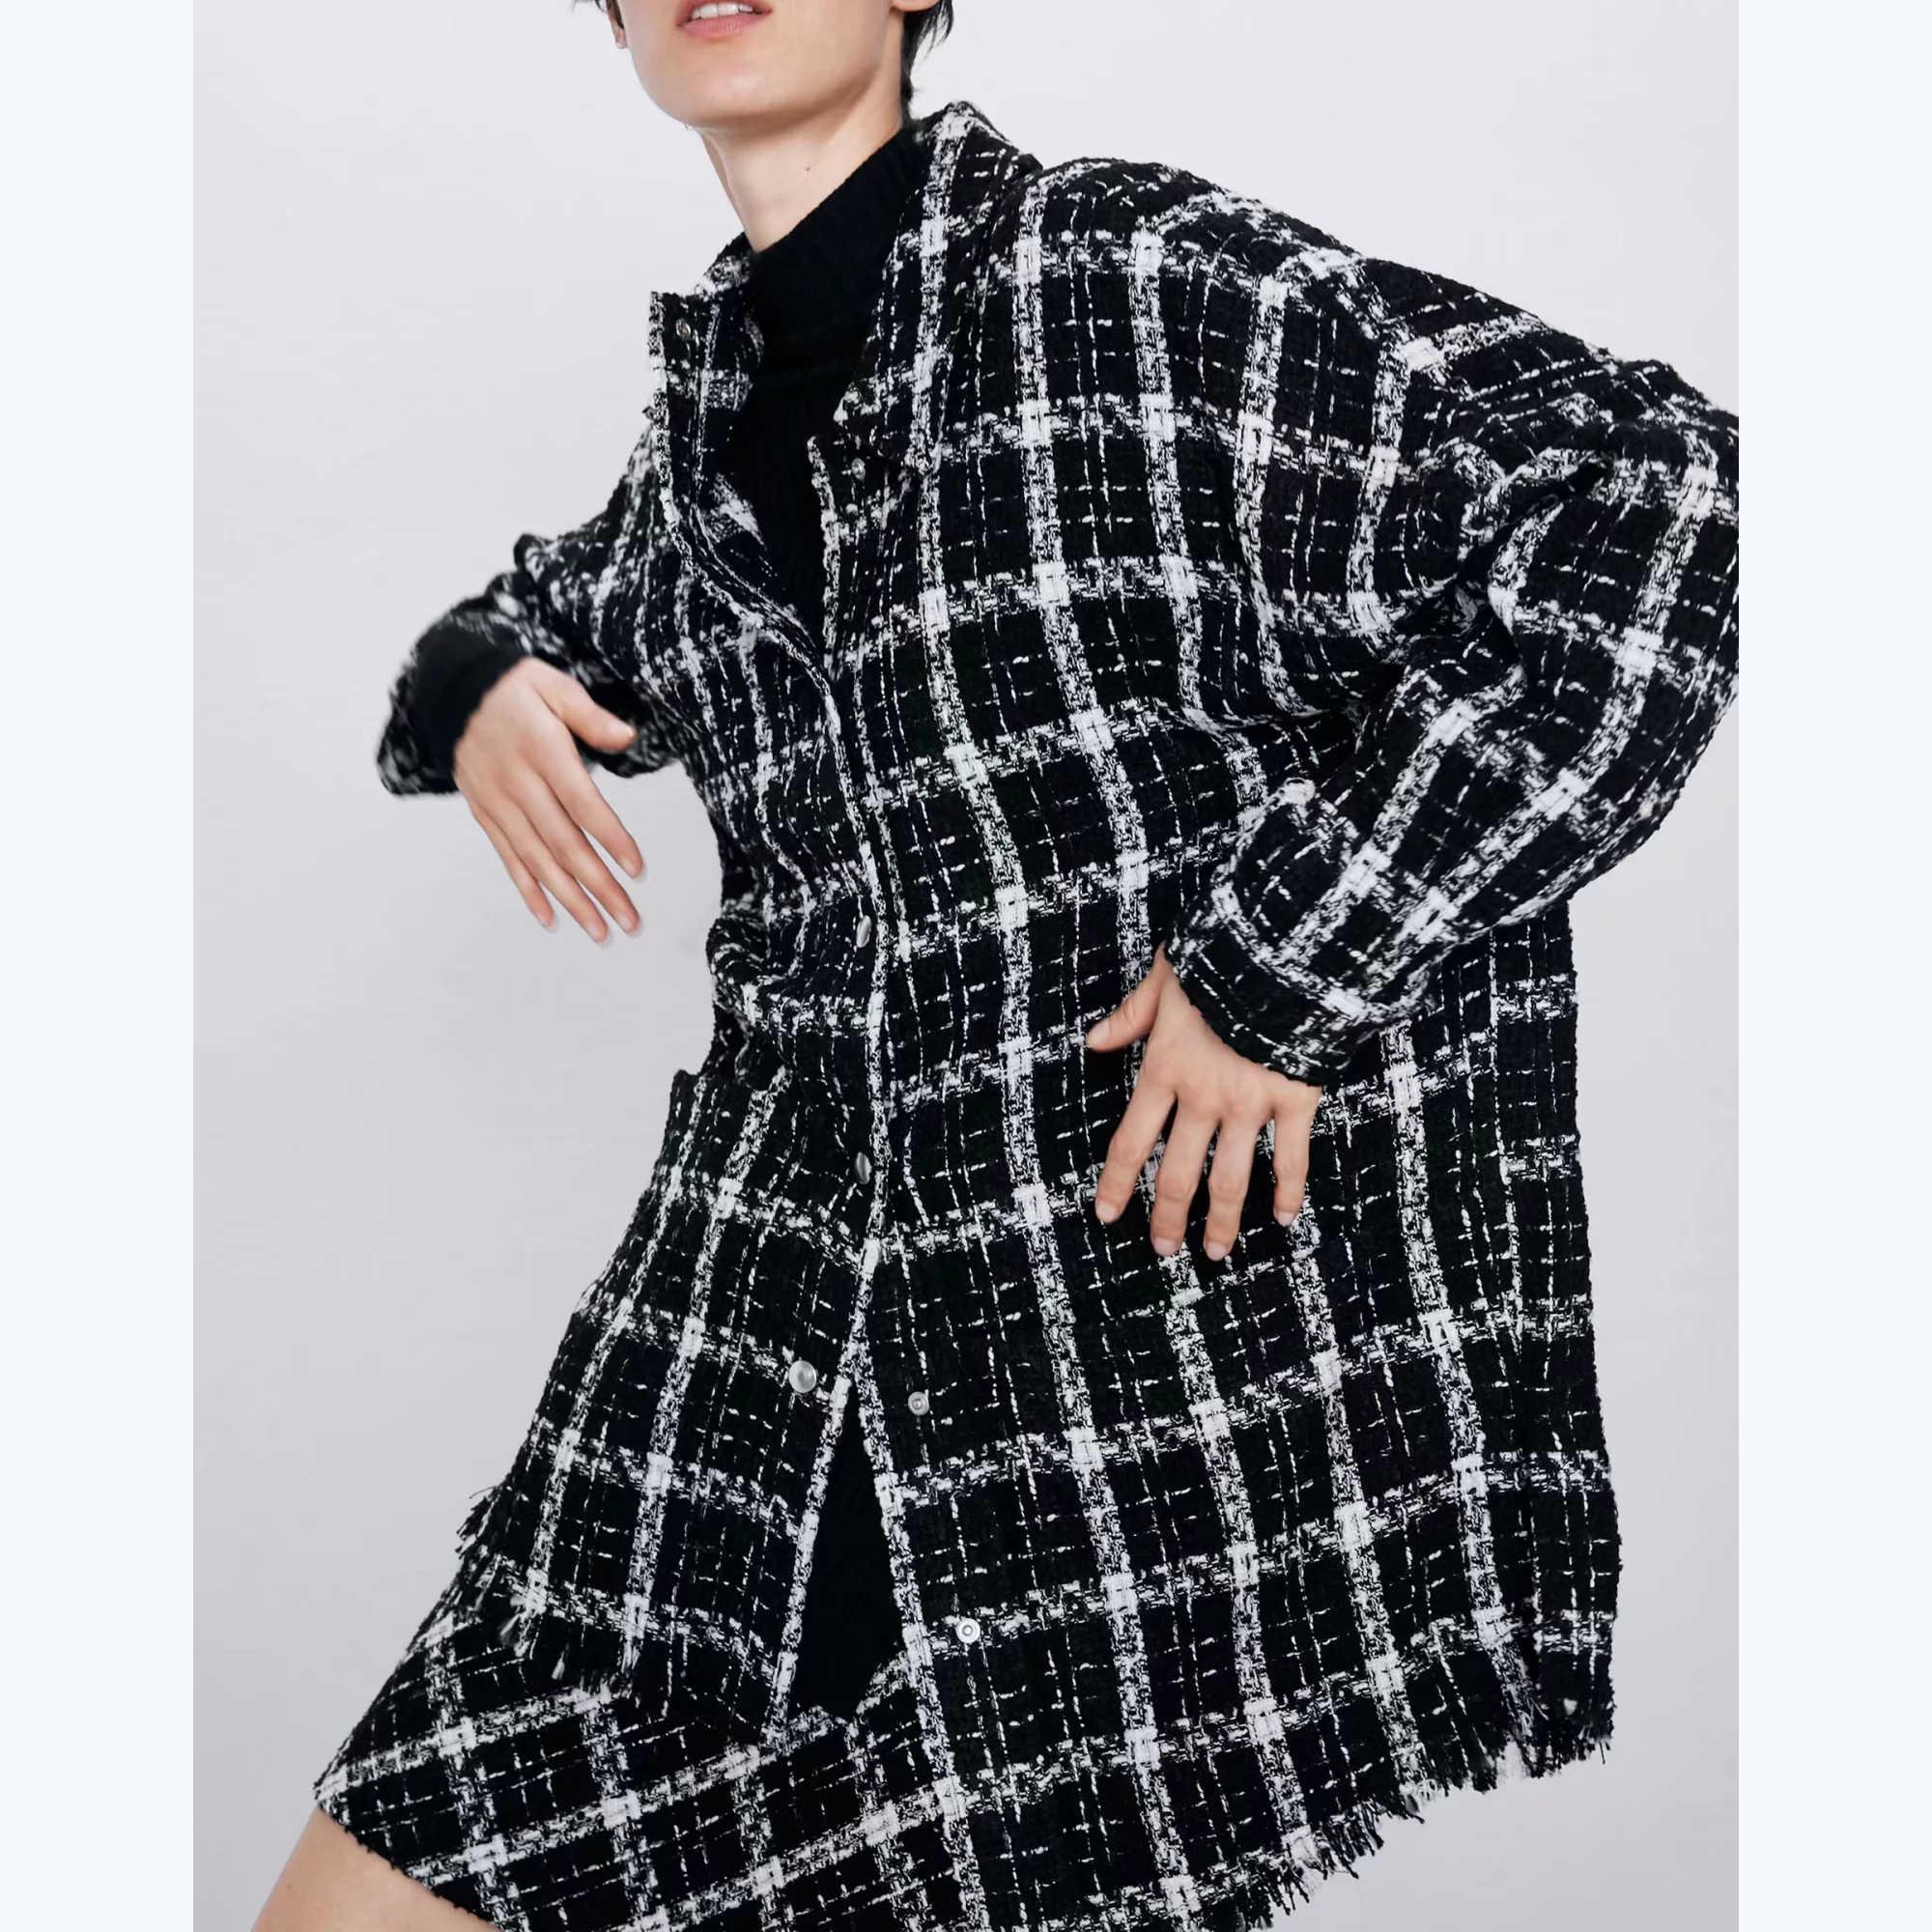 Za 秋冬女性の黒-白のチェック柄シャツプラス厚いコート暖かい生き抜くヴィンテージオーバーサイズのコート女性 shirtwear